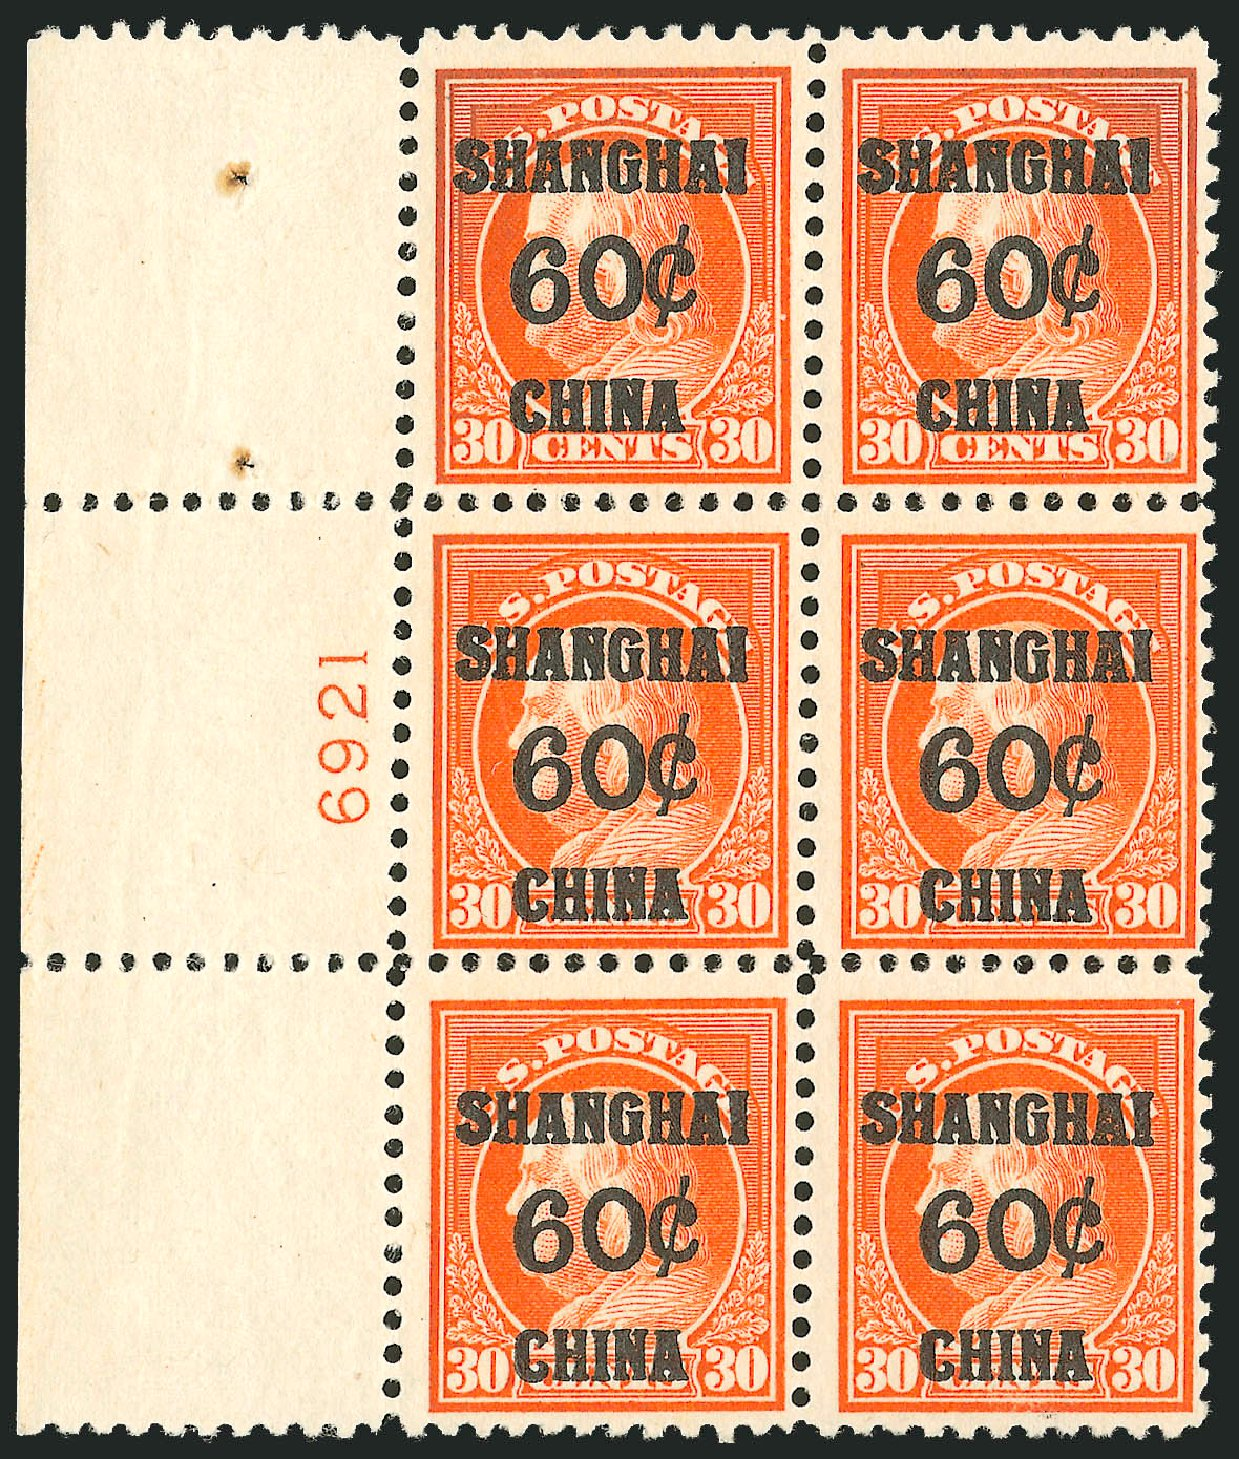 US Stamps Values Scott # K14 - 60c 1919 China Shanghai on 30c. Robert Siegel Auction Galleries, Jun 2012, Sale 1026, Lot 1536